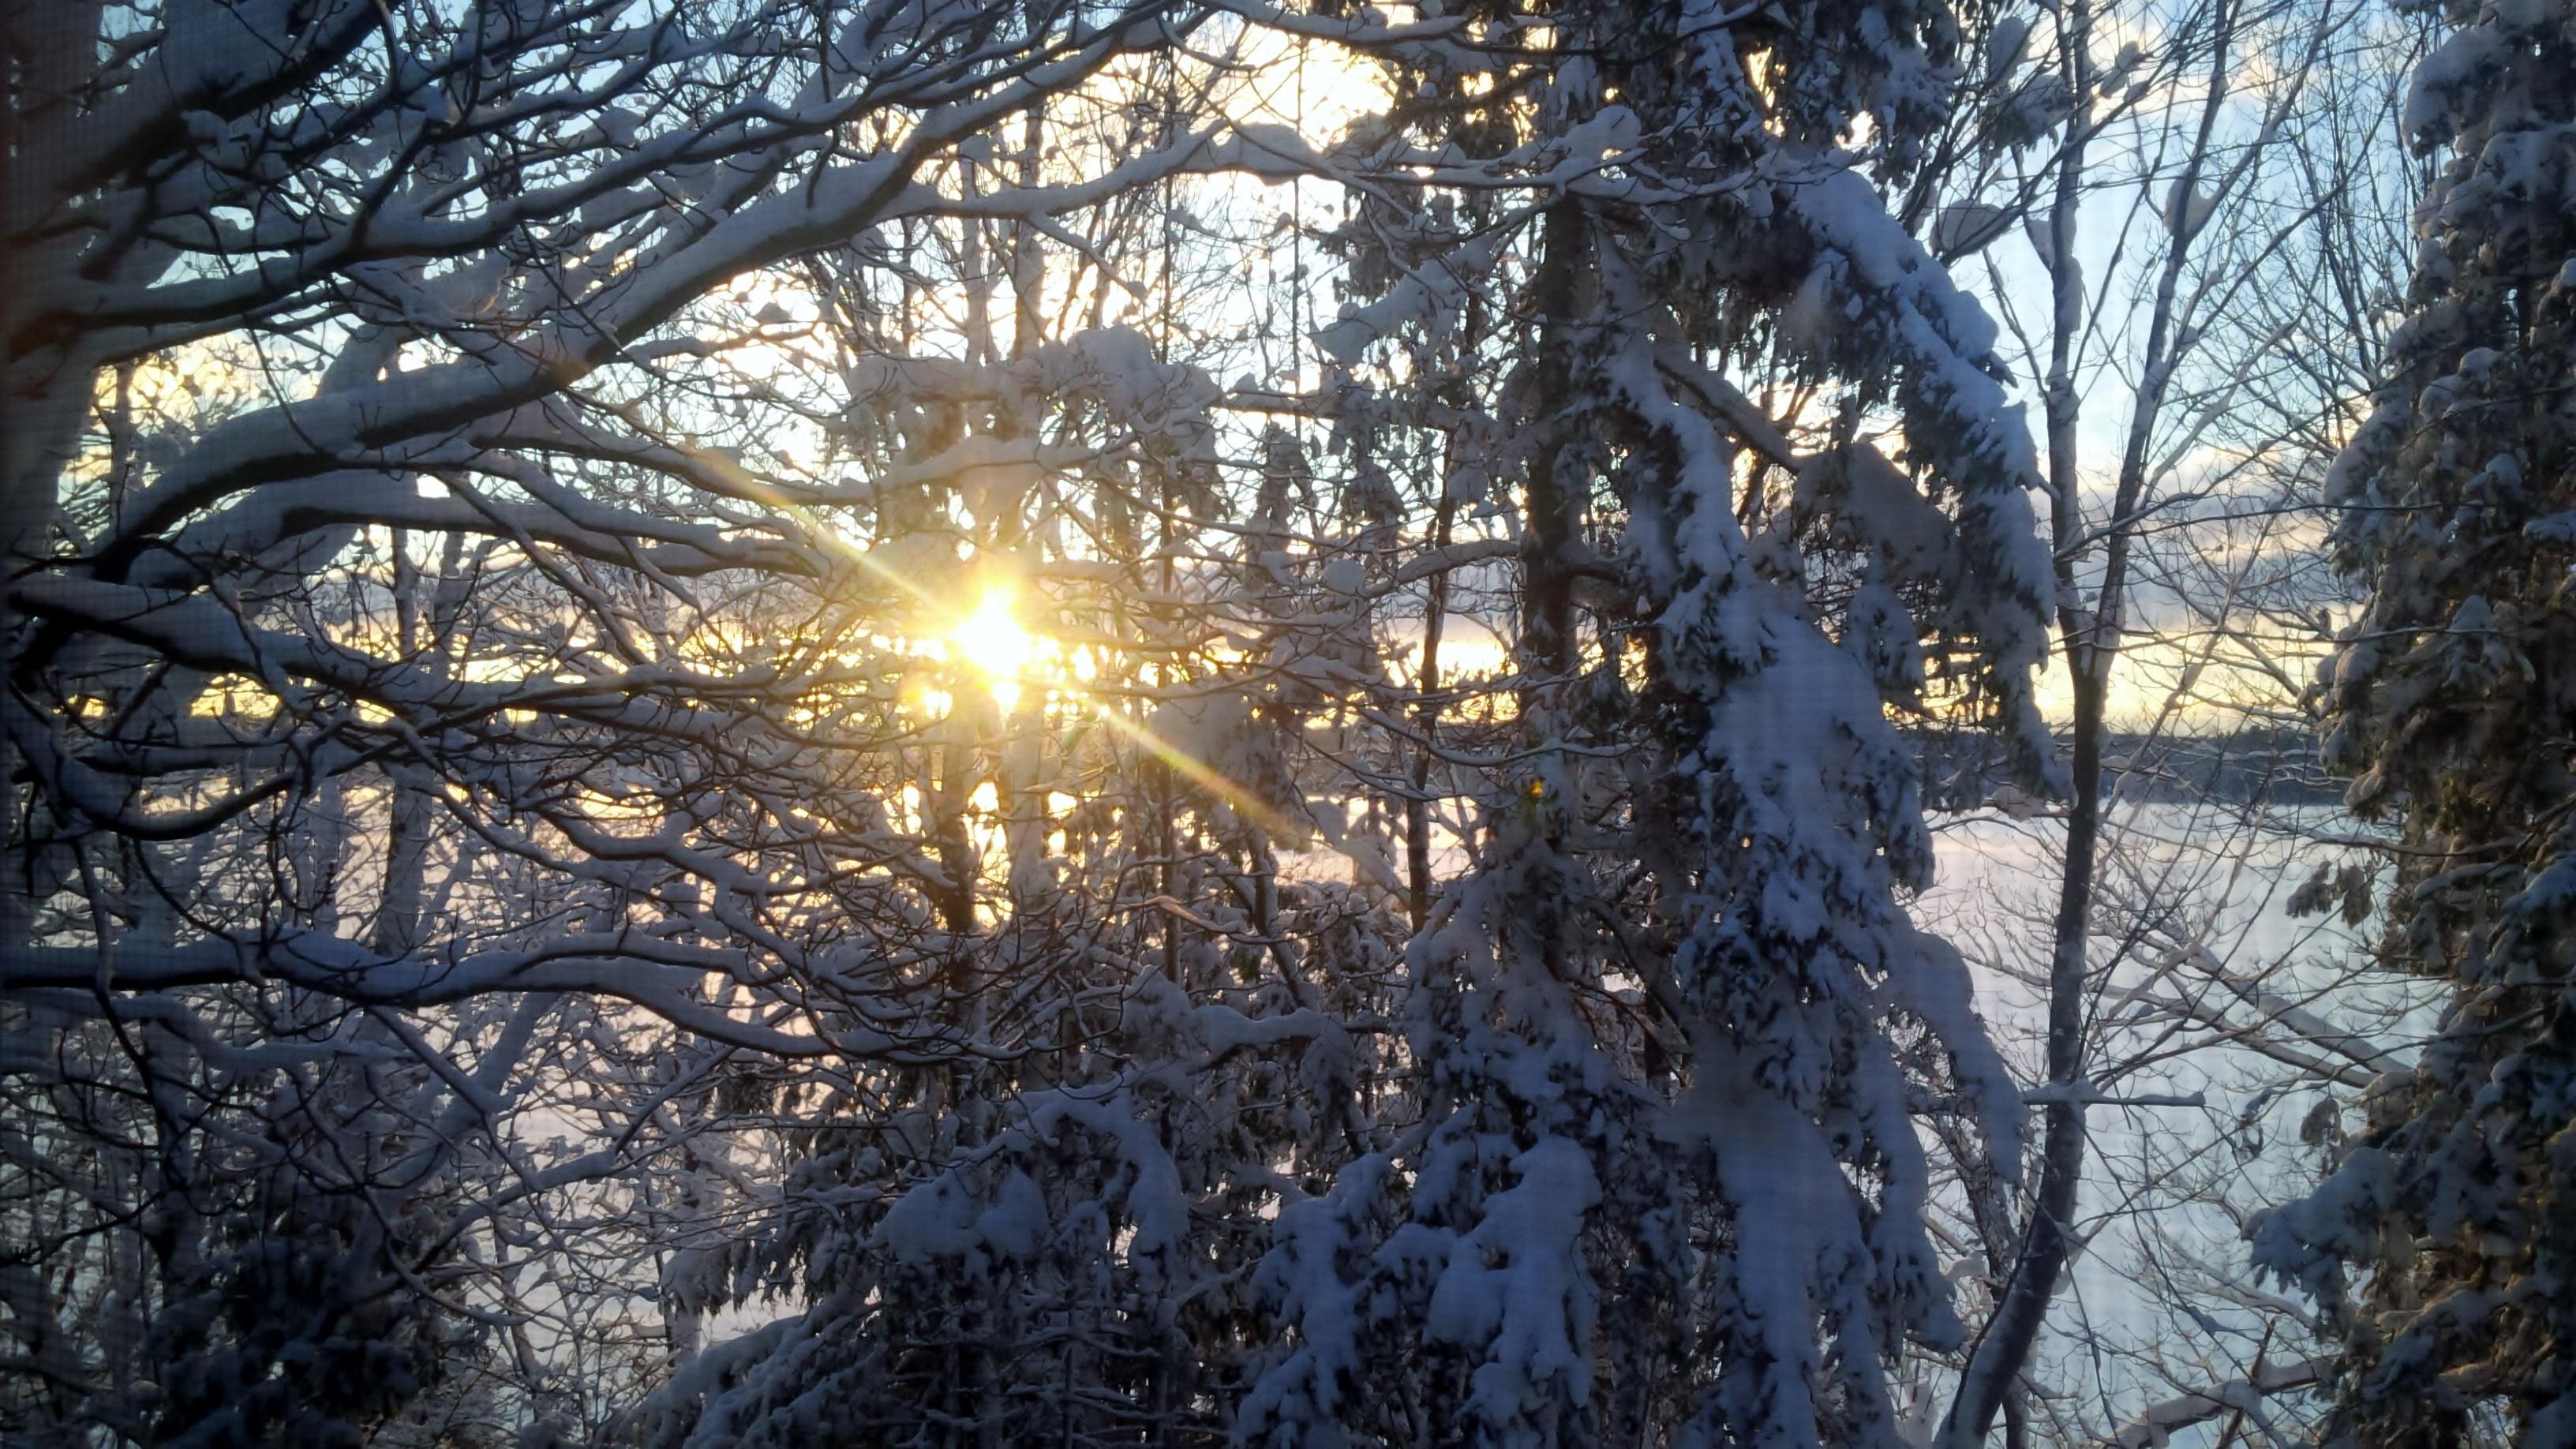 Filler_Sun_Through_Snowy_Trees.jpg